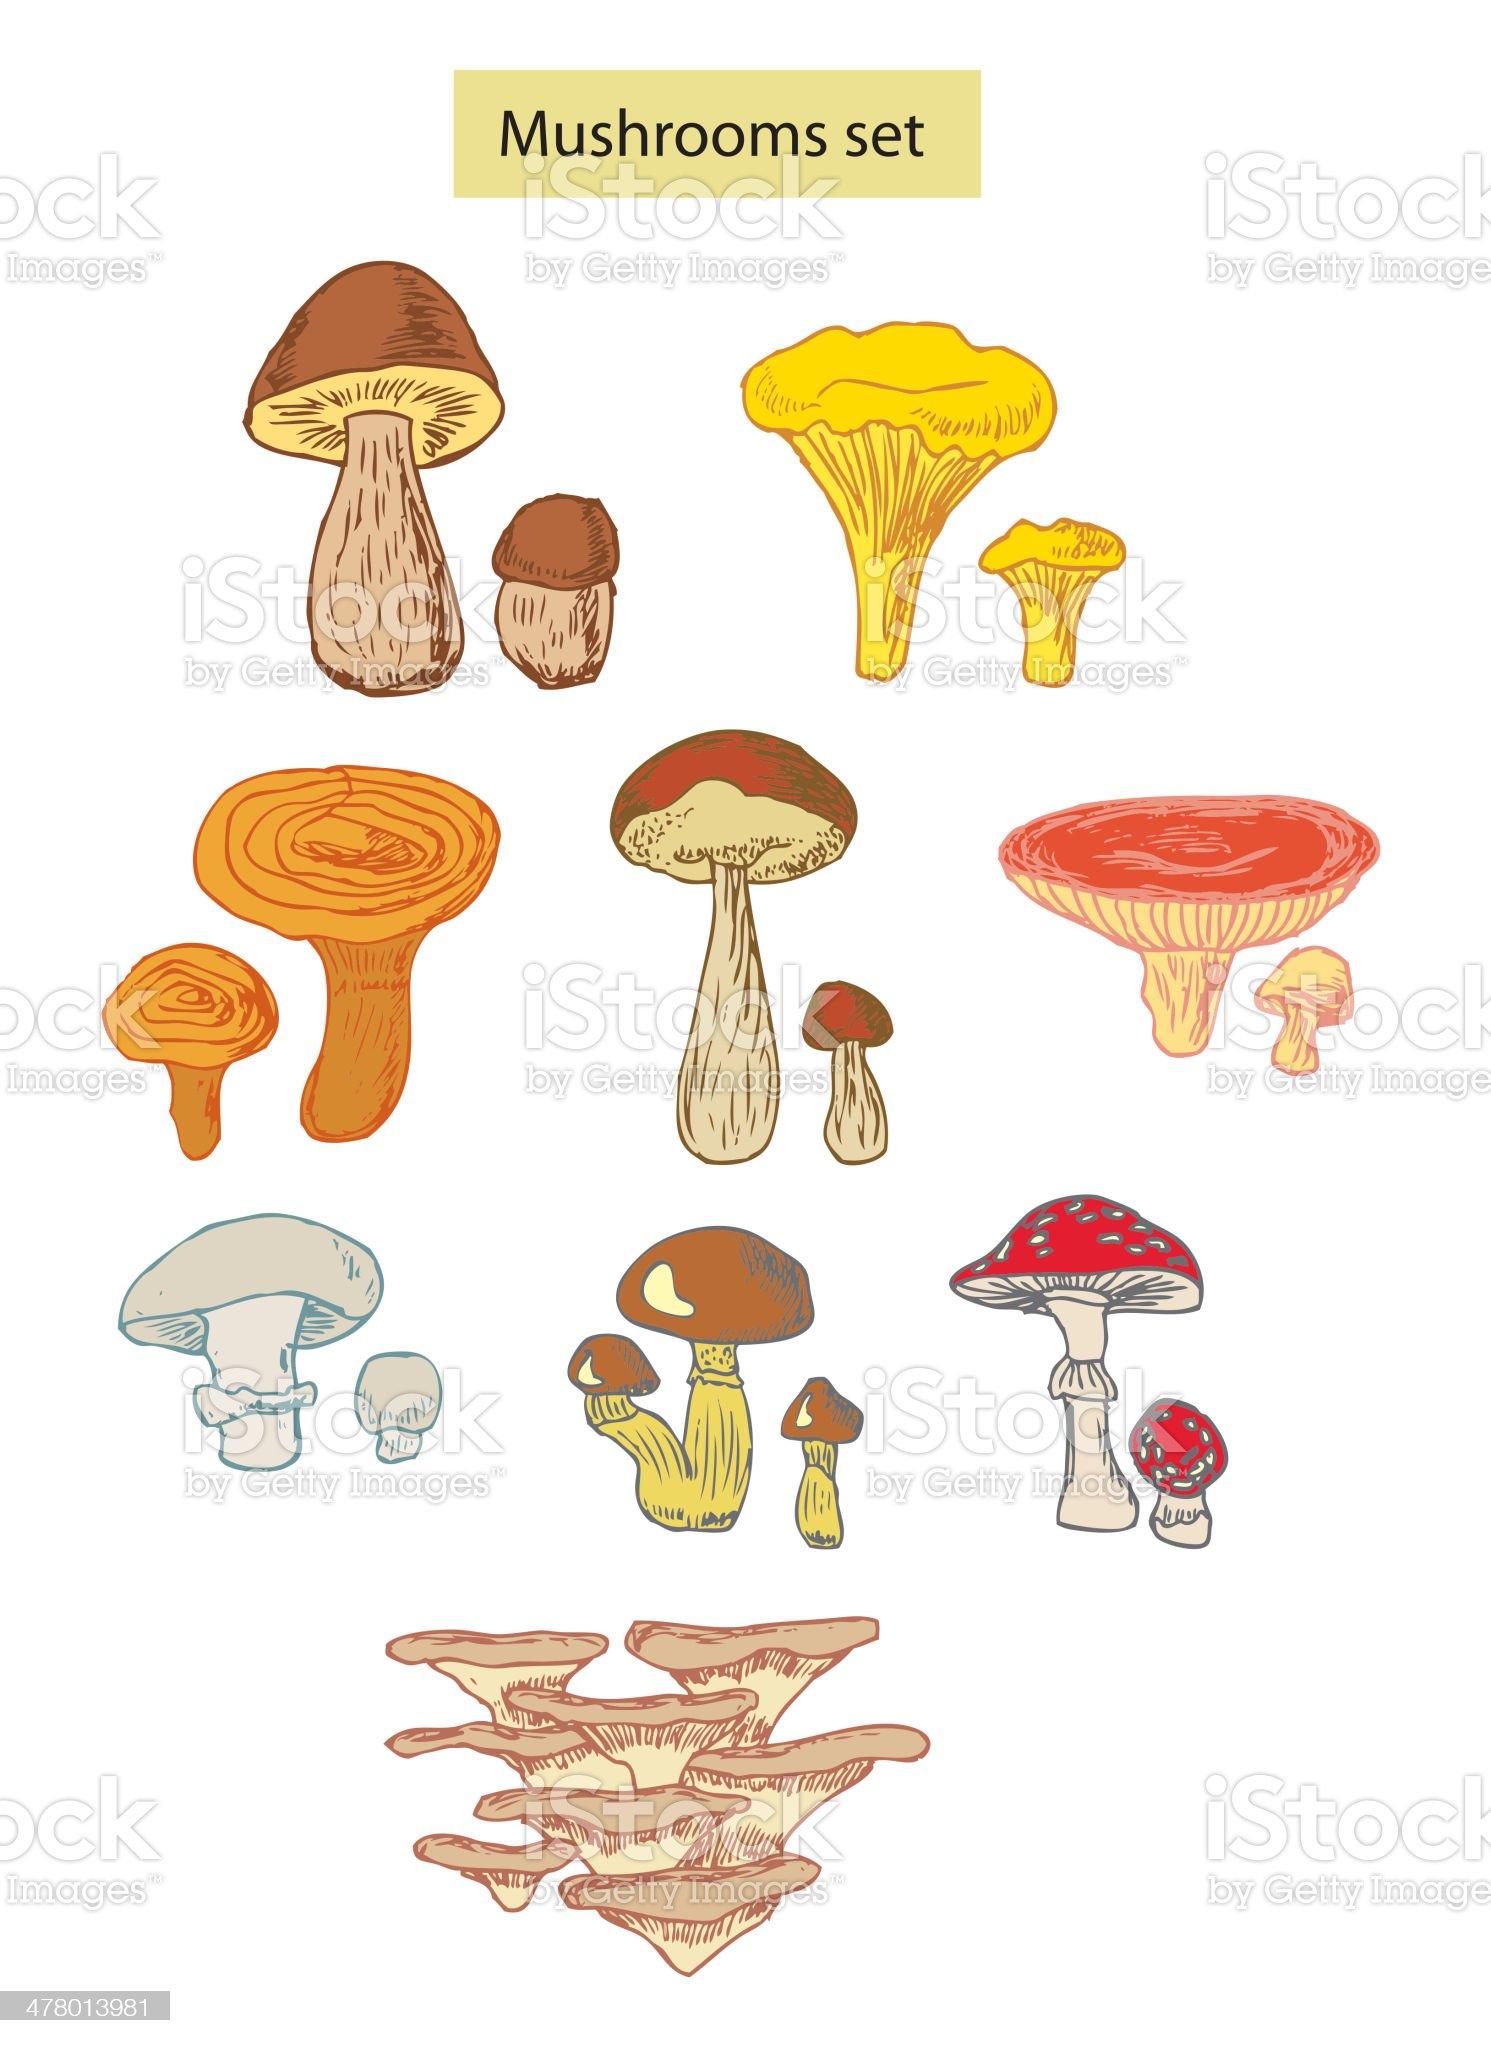 mushrooms set detailed illustration royalty-free stock vector art